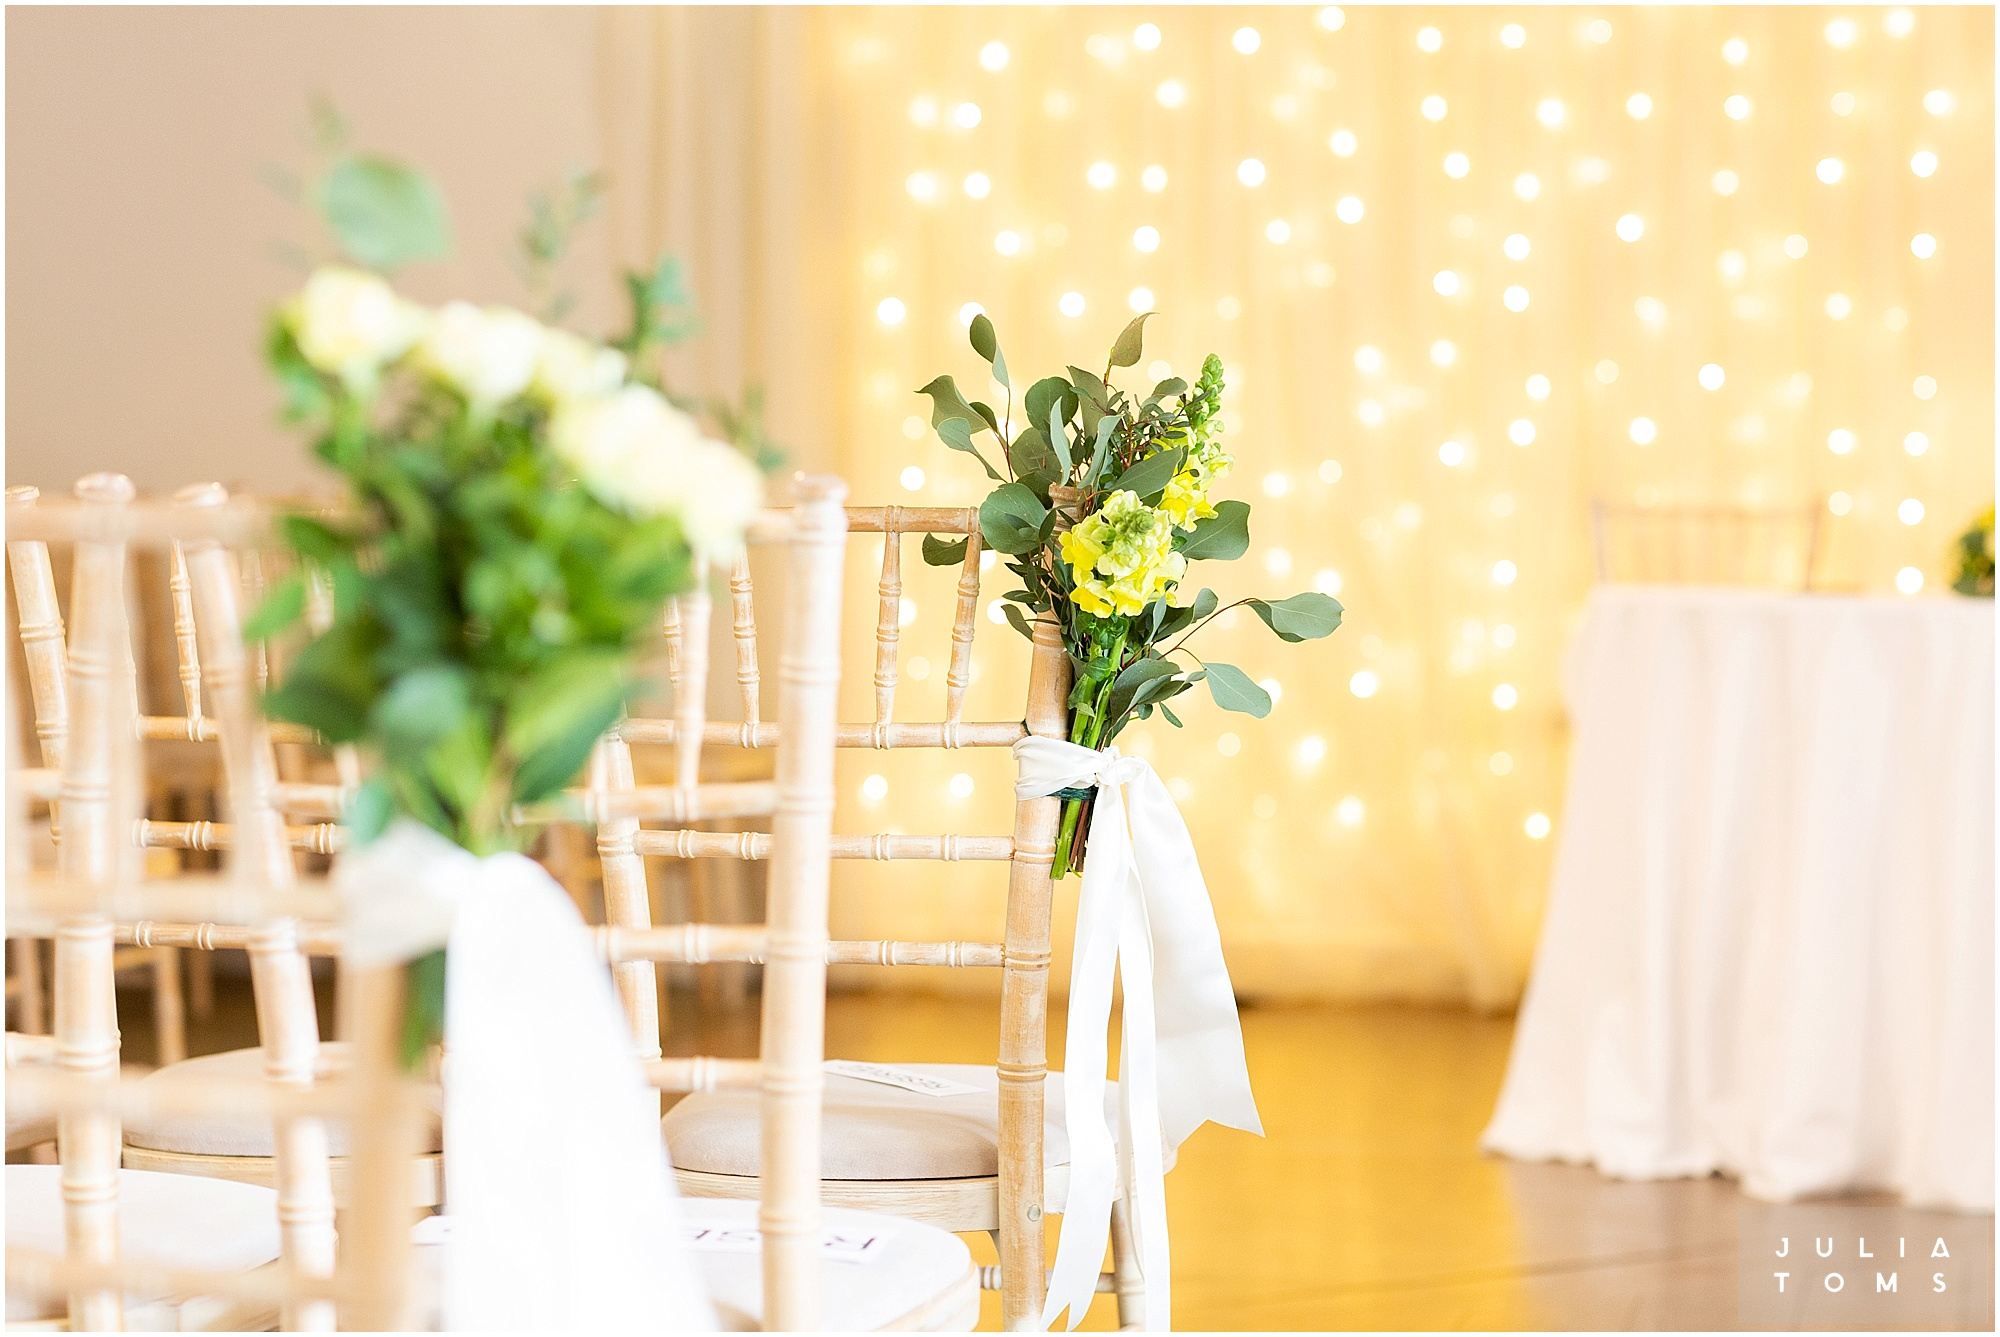 farbridge_barn_wedding_photographer_chichester_017.jpg